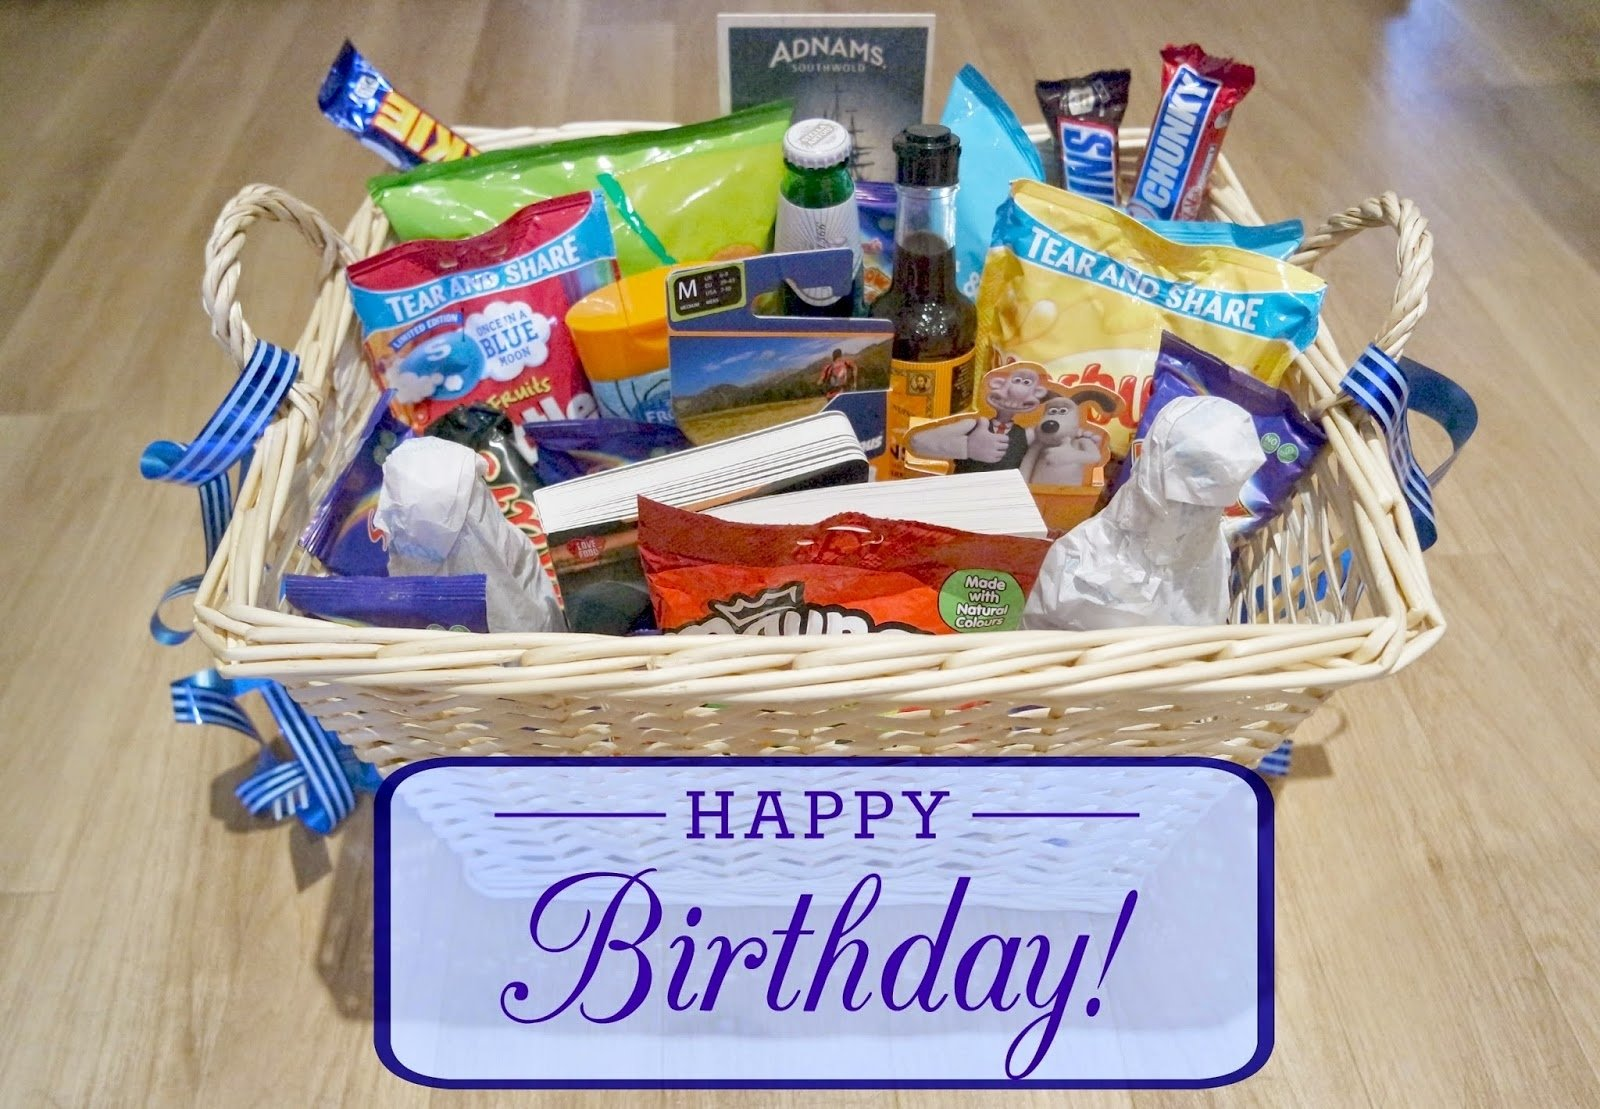 10 Trendy Ideas For 50Th Birthday Gift uptown peach my dads 50th birthday hamper mens gift ideas 8